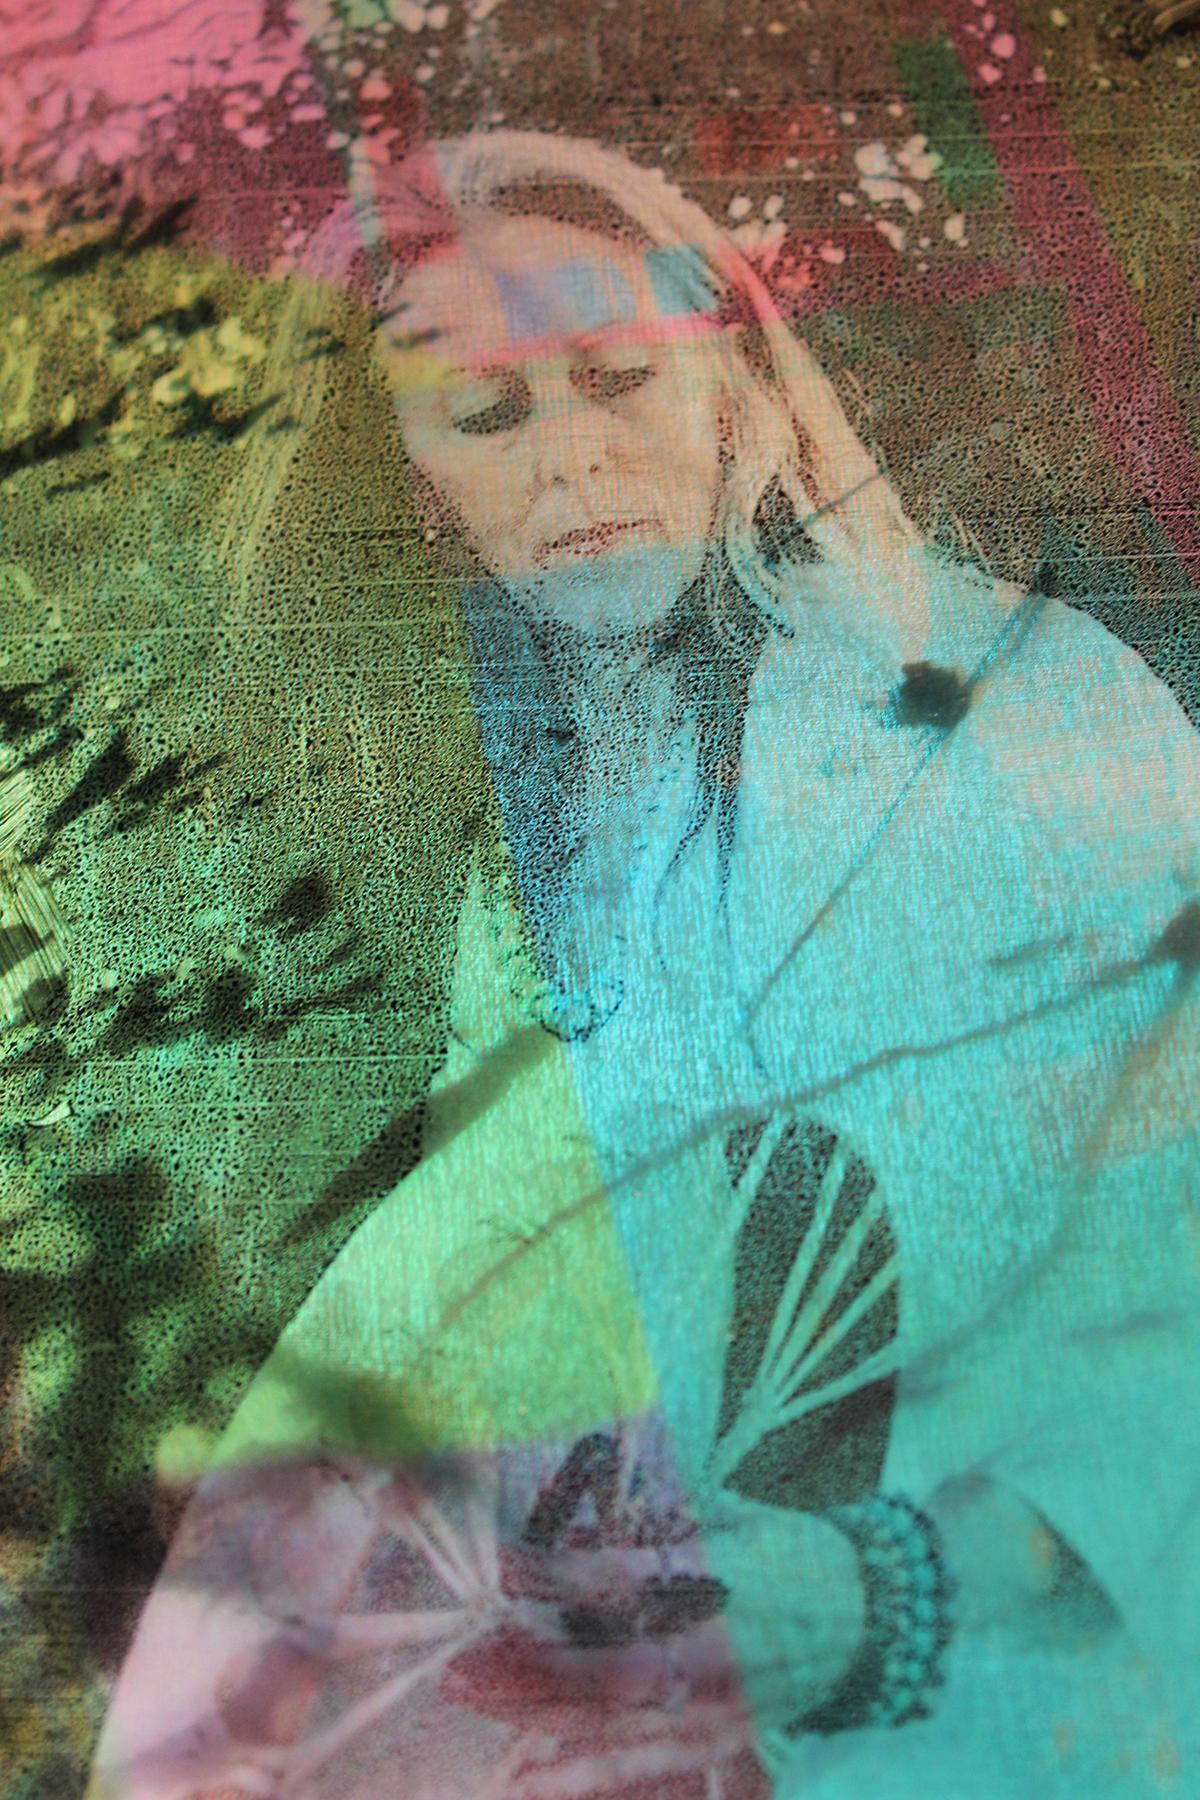 Jan_Lobban_ Loving being_With her spirits 03.jpg.jpg